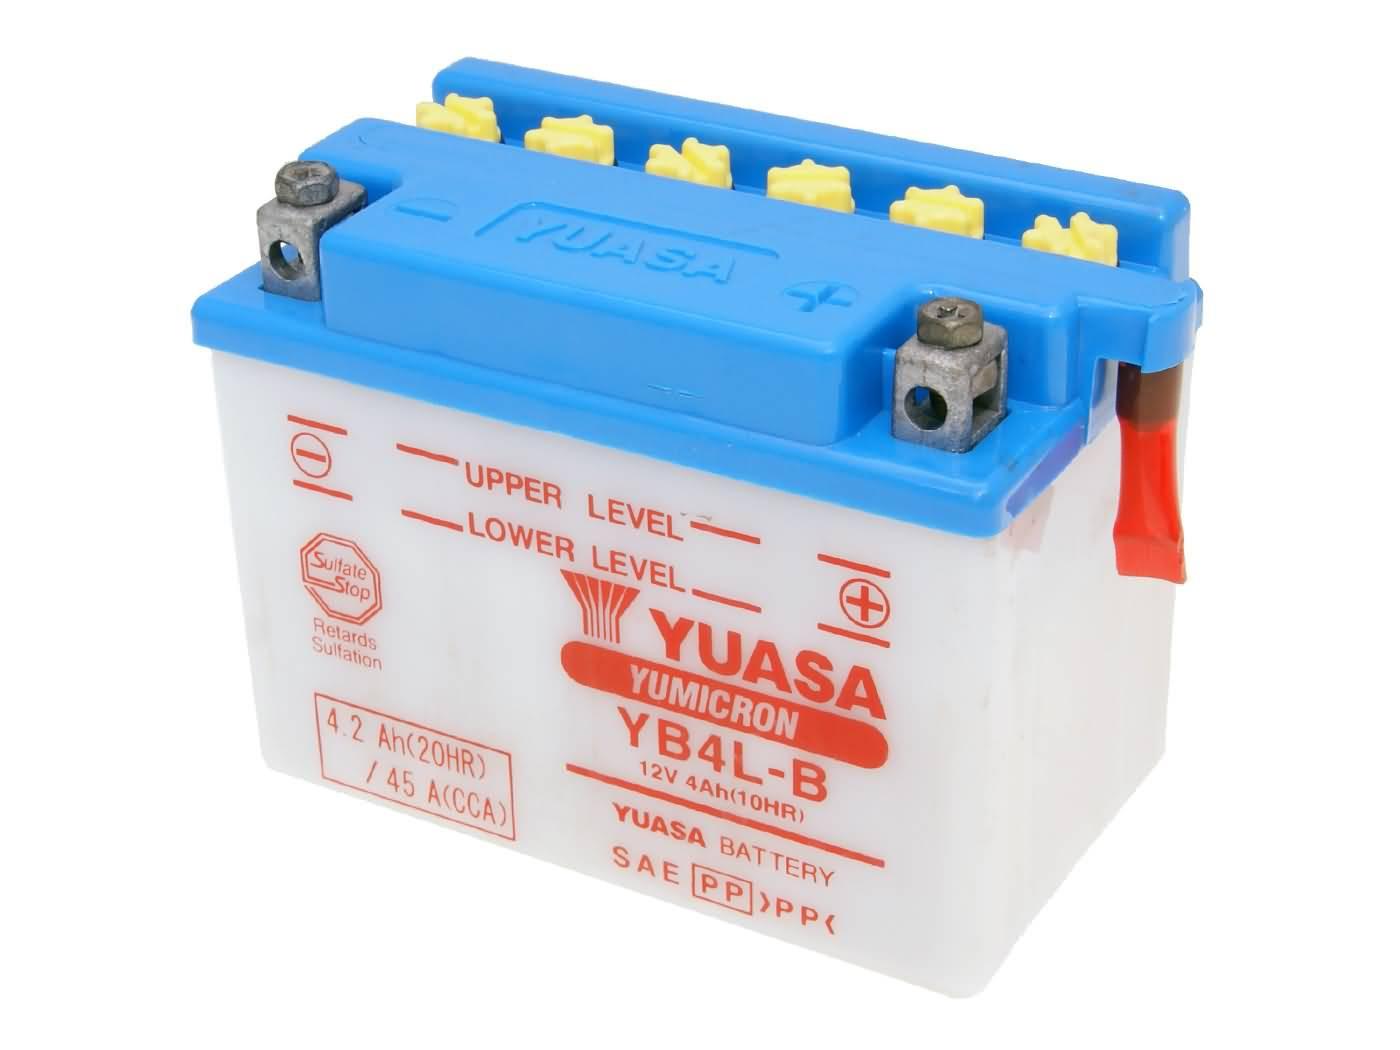 Yuasa YuMicron YB4L-B akkumulátor - savcsomag nélkül